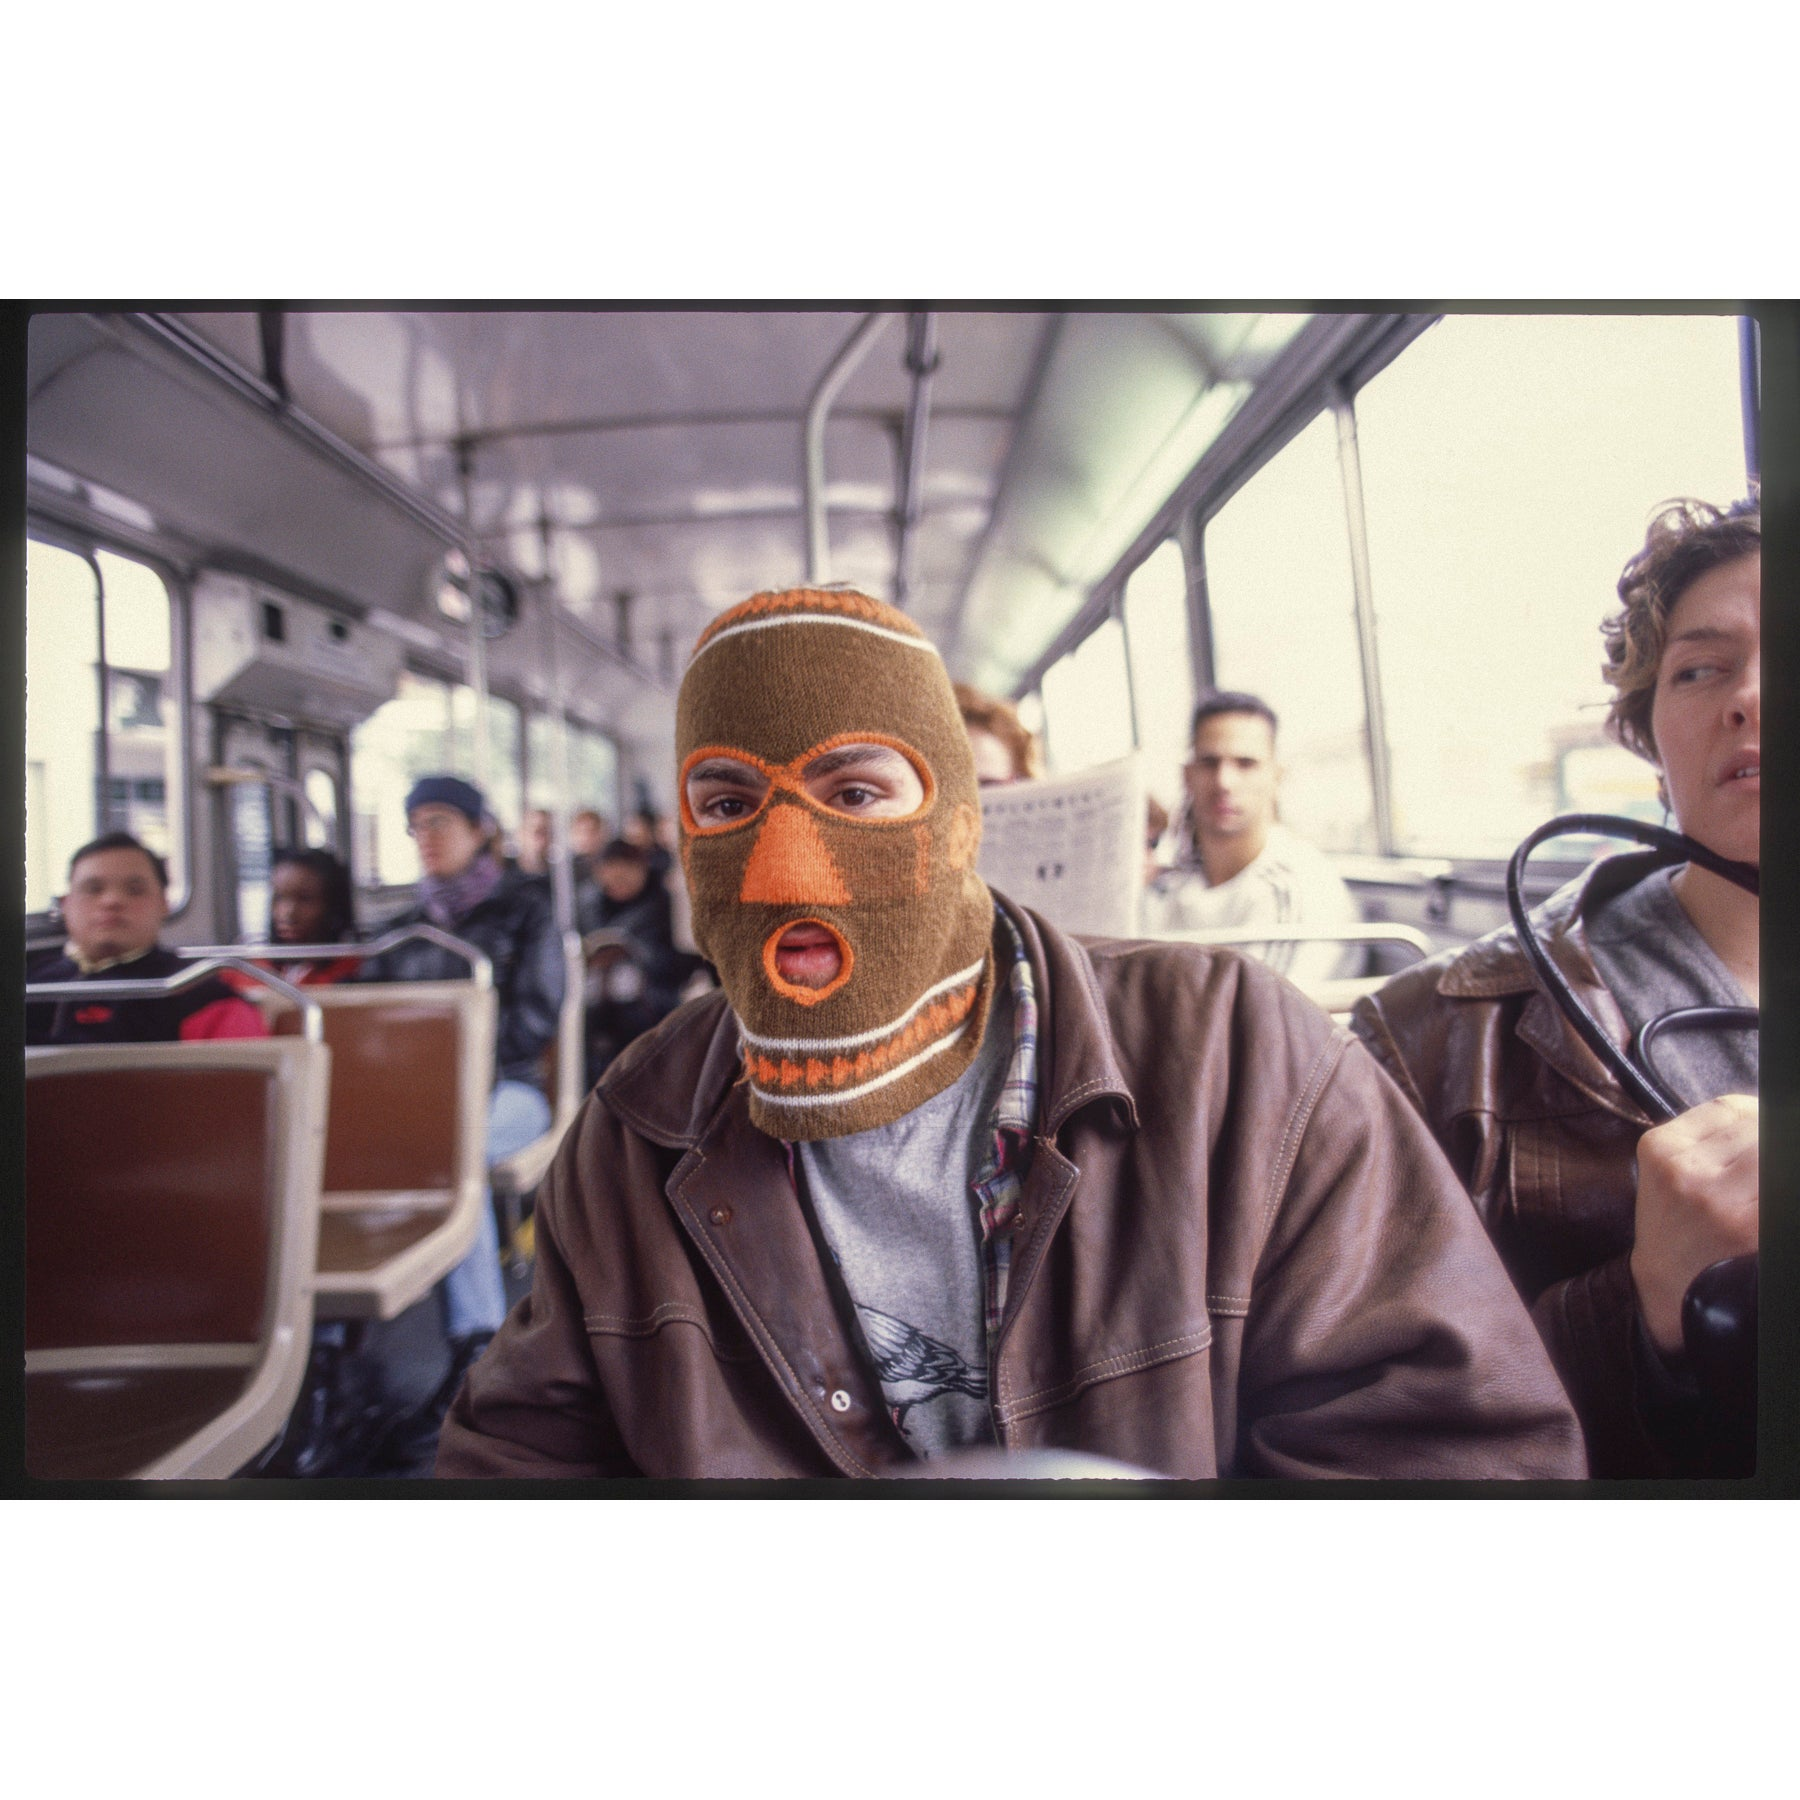 Image of Sean Young San Francisco 1998-0105-09 Anti Hero skater, by Tobin Yelland